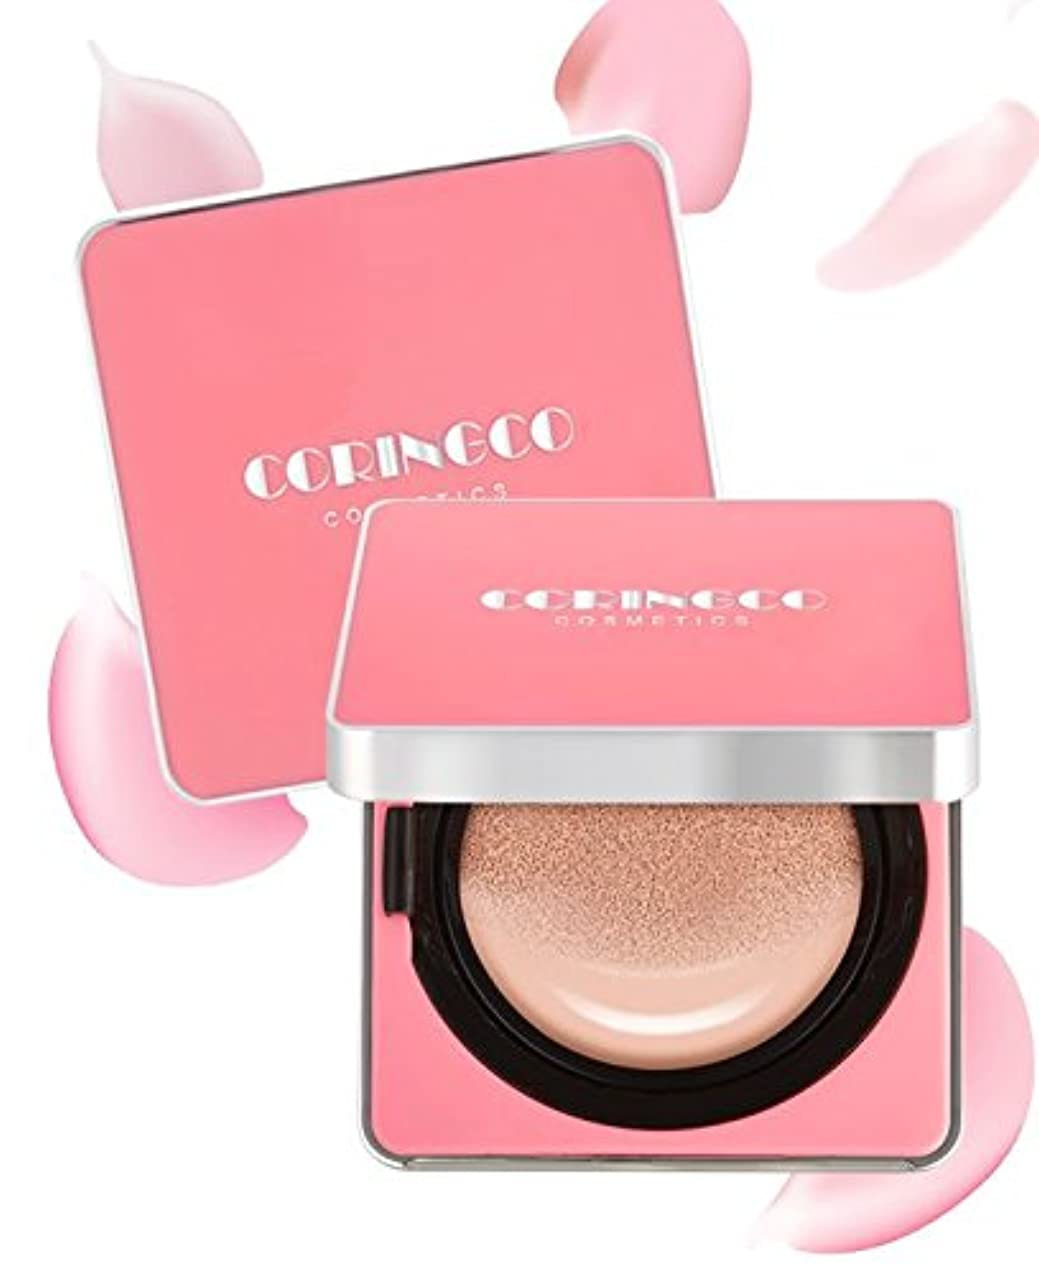 CORINGCO Cherry Blossom Water Cushion 15g + Refill 15g (#23 Light Beige)/コリンコ チェリーブロッサム ウォーター クッション 15g + リフィル...